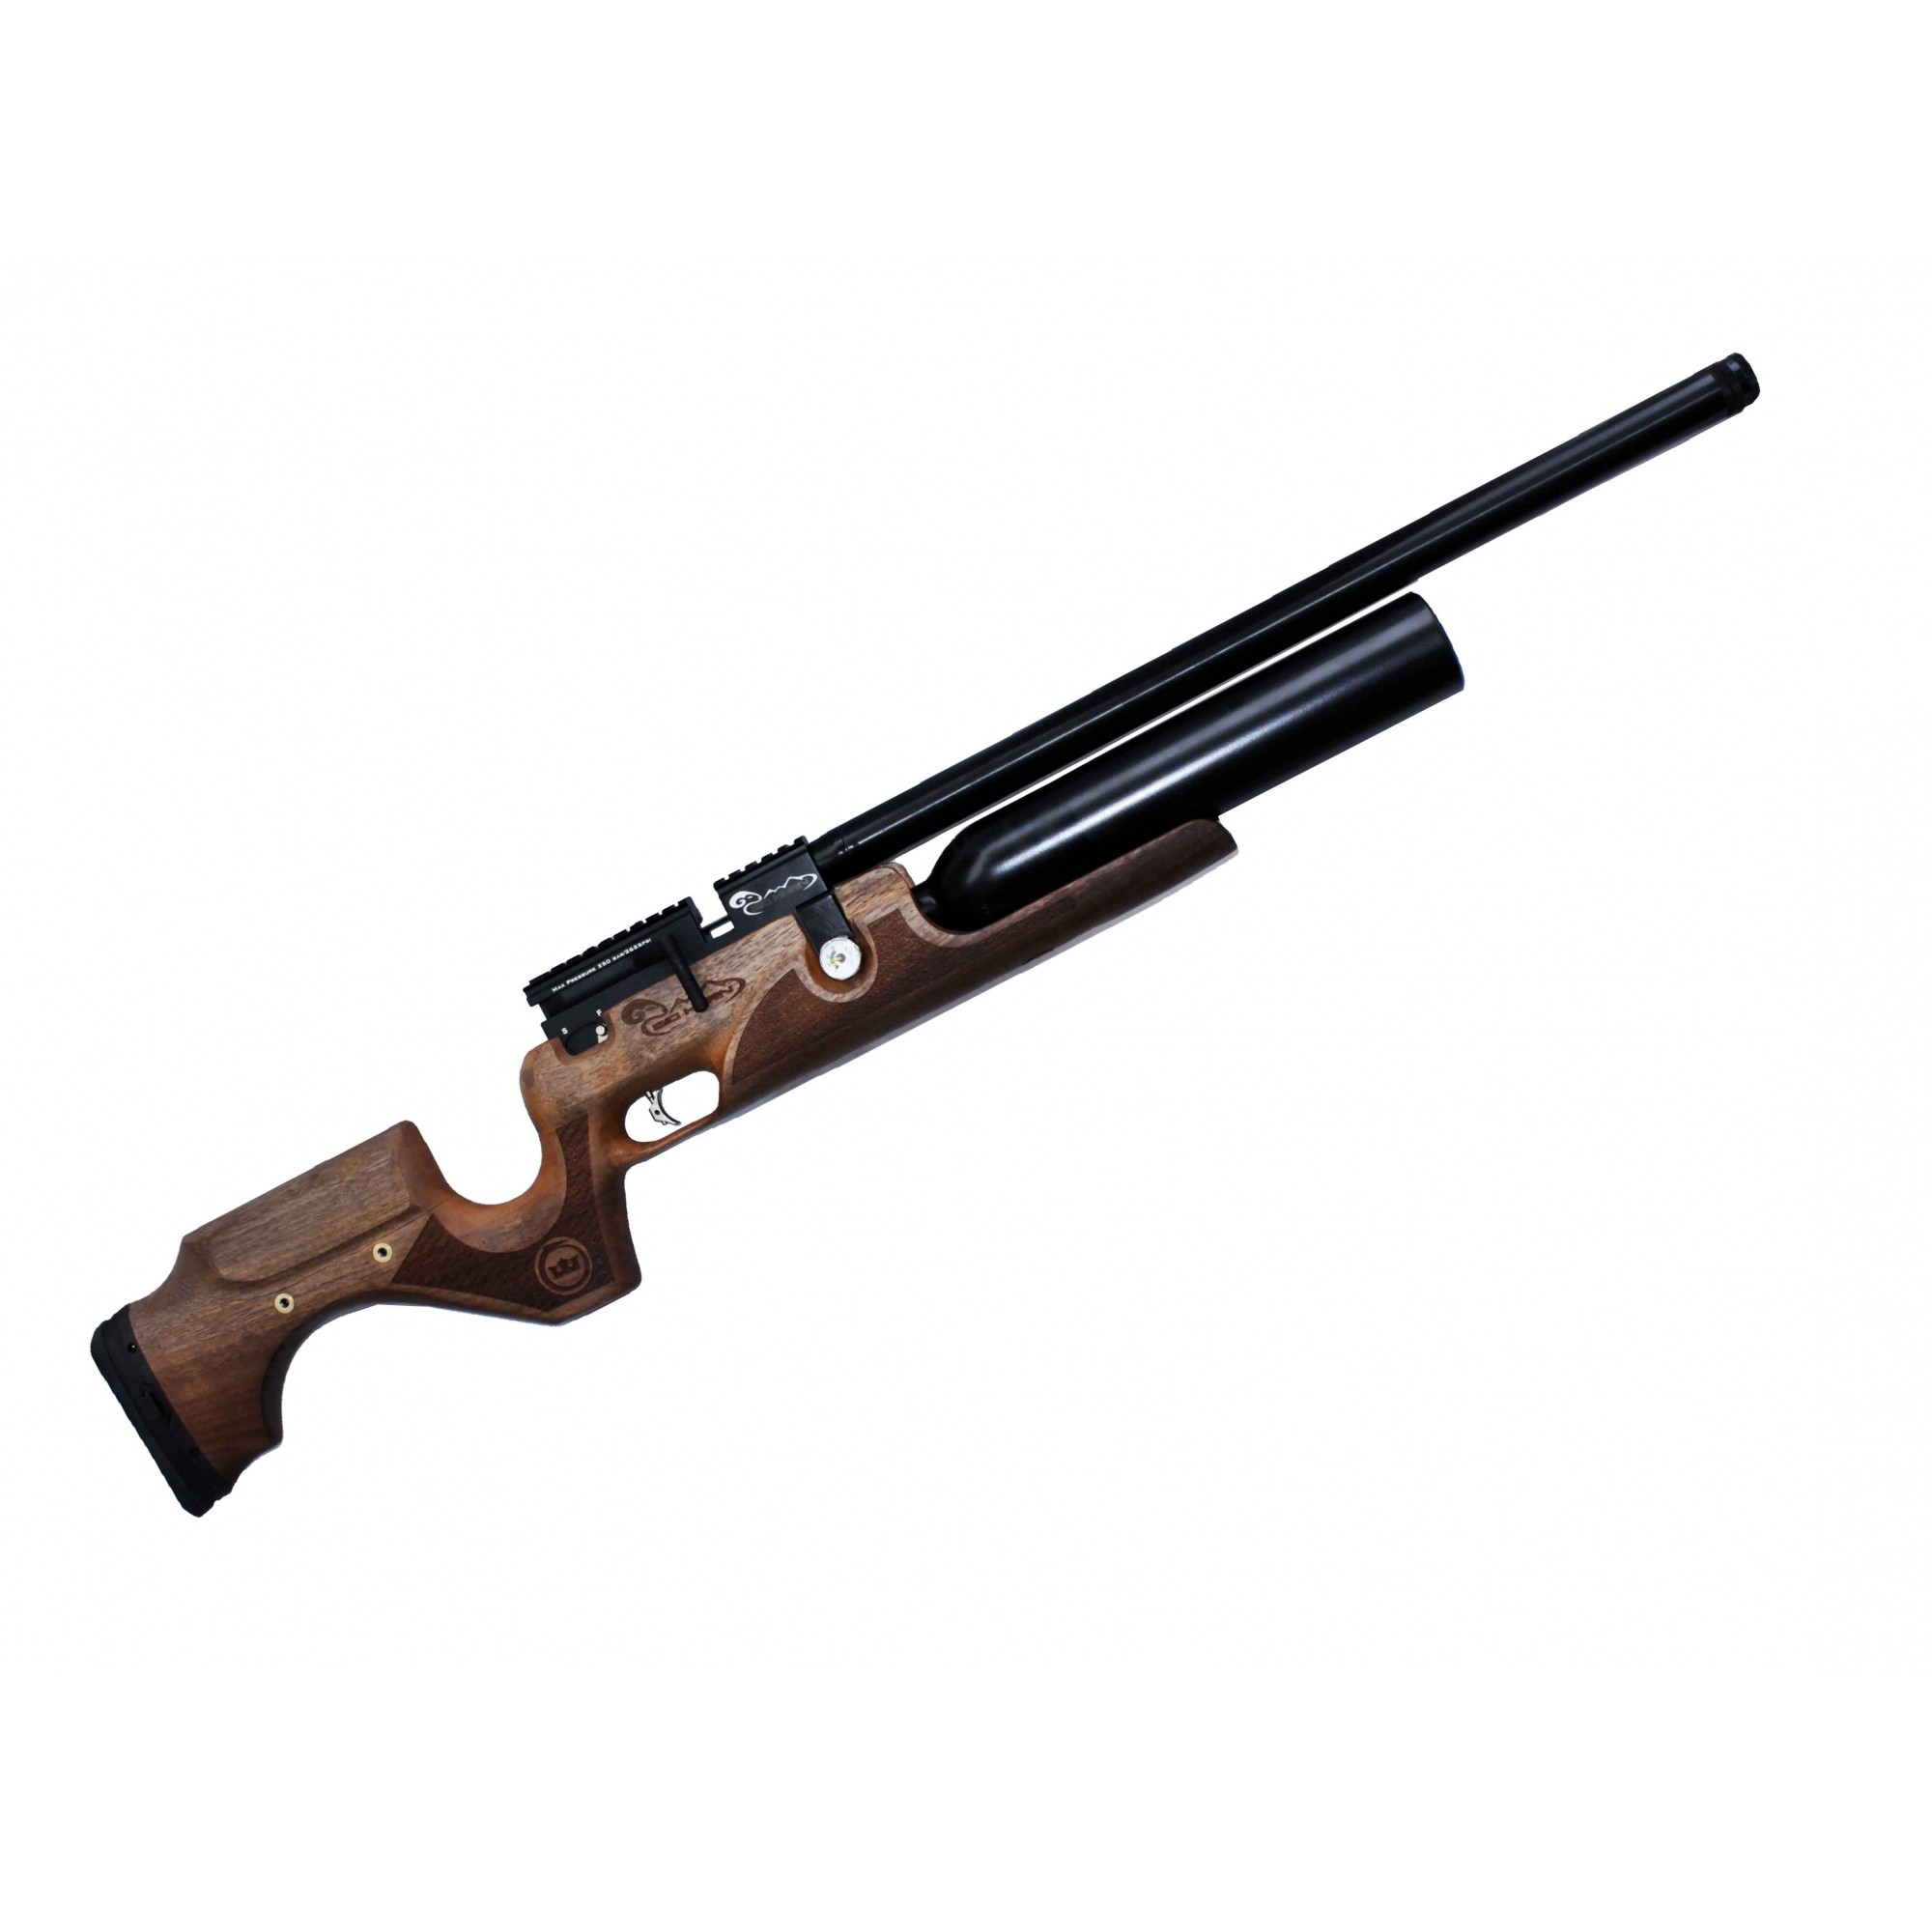 Carabina PCP Kral Puncher Bighorn 6,35mm